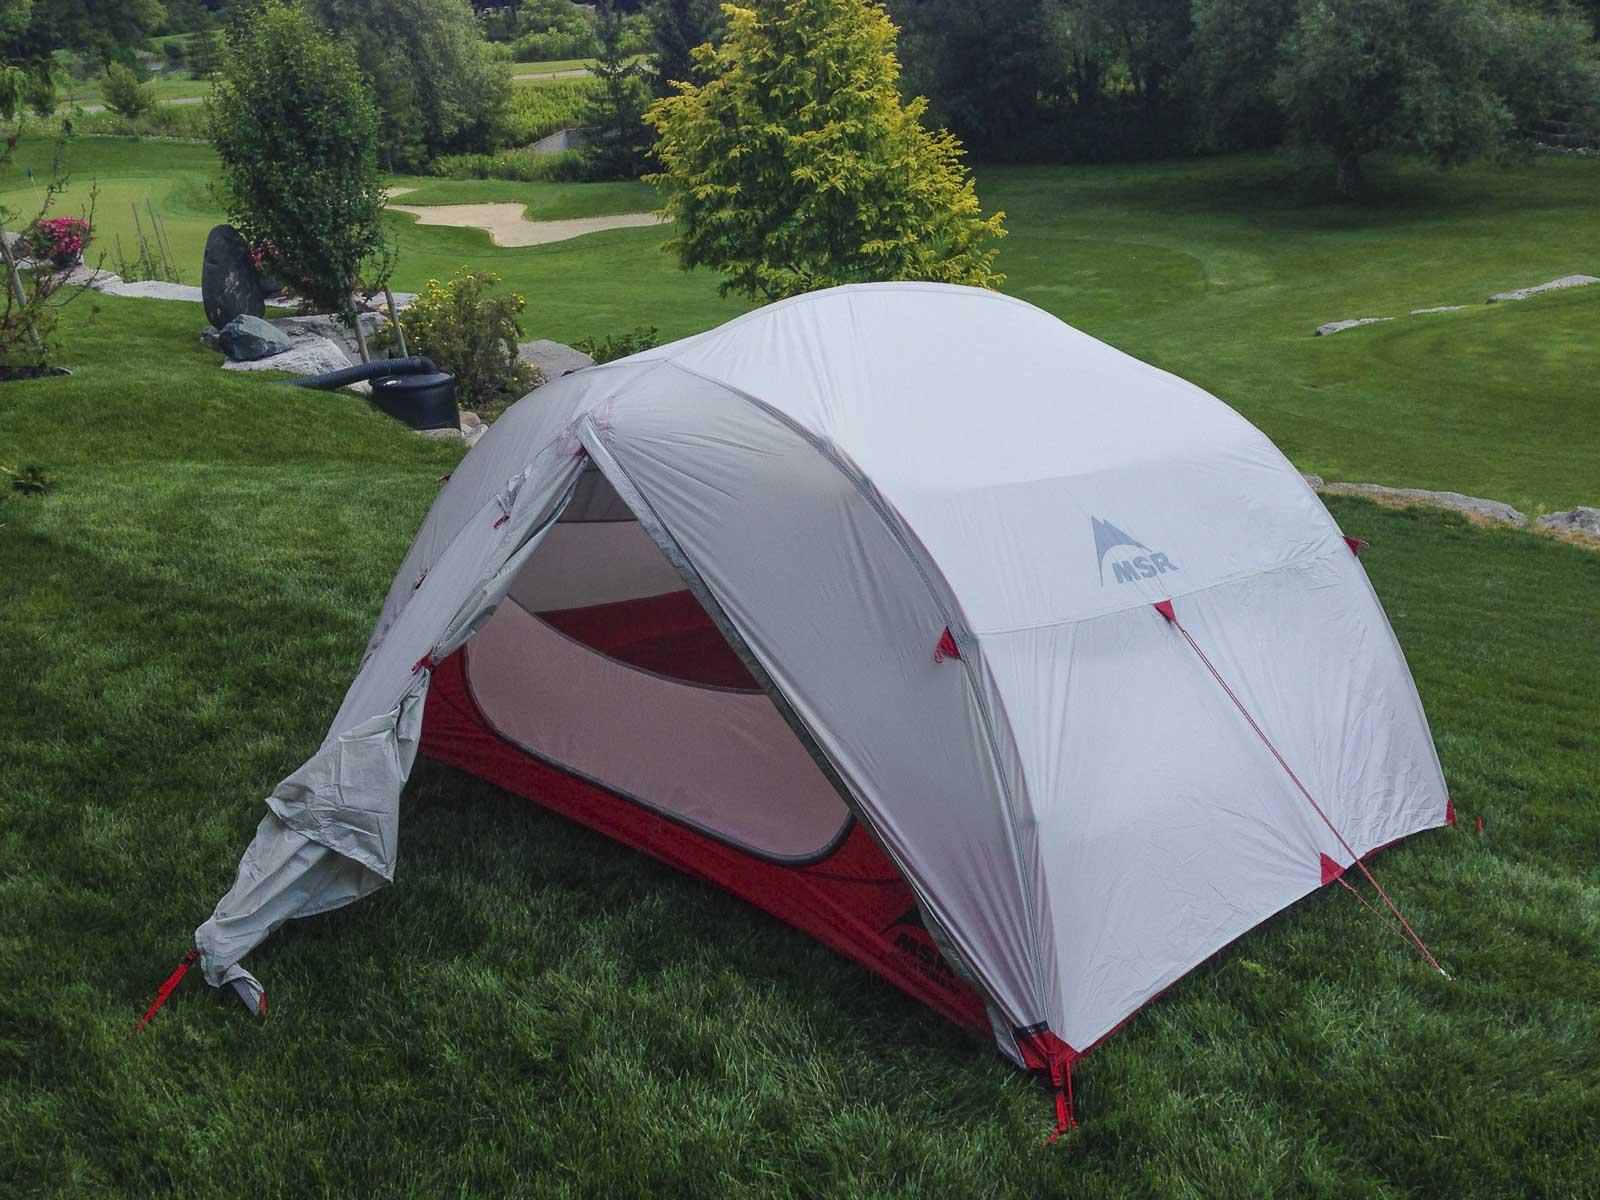 Practicing Camp setup at home